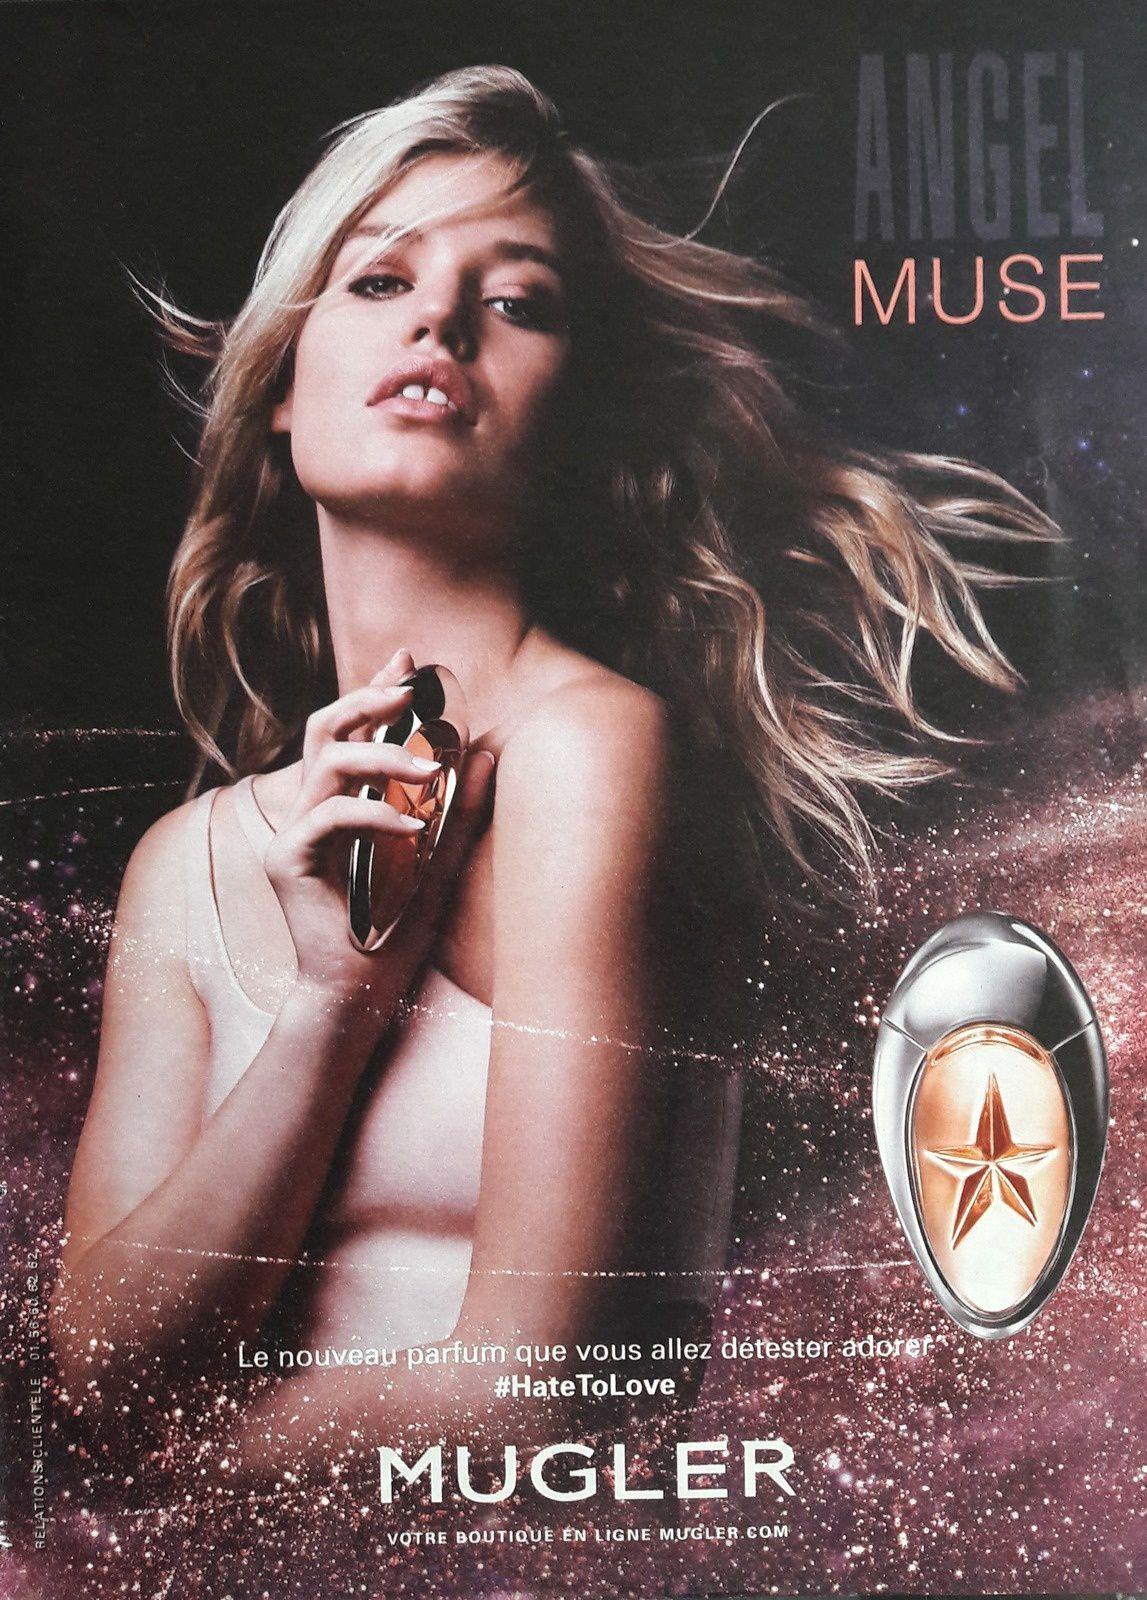 Angel Muse de Thierry MUGLER